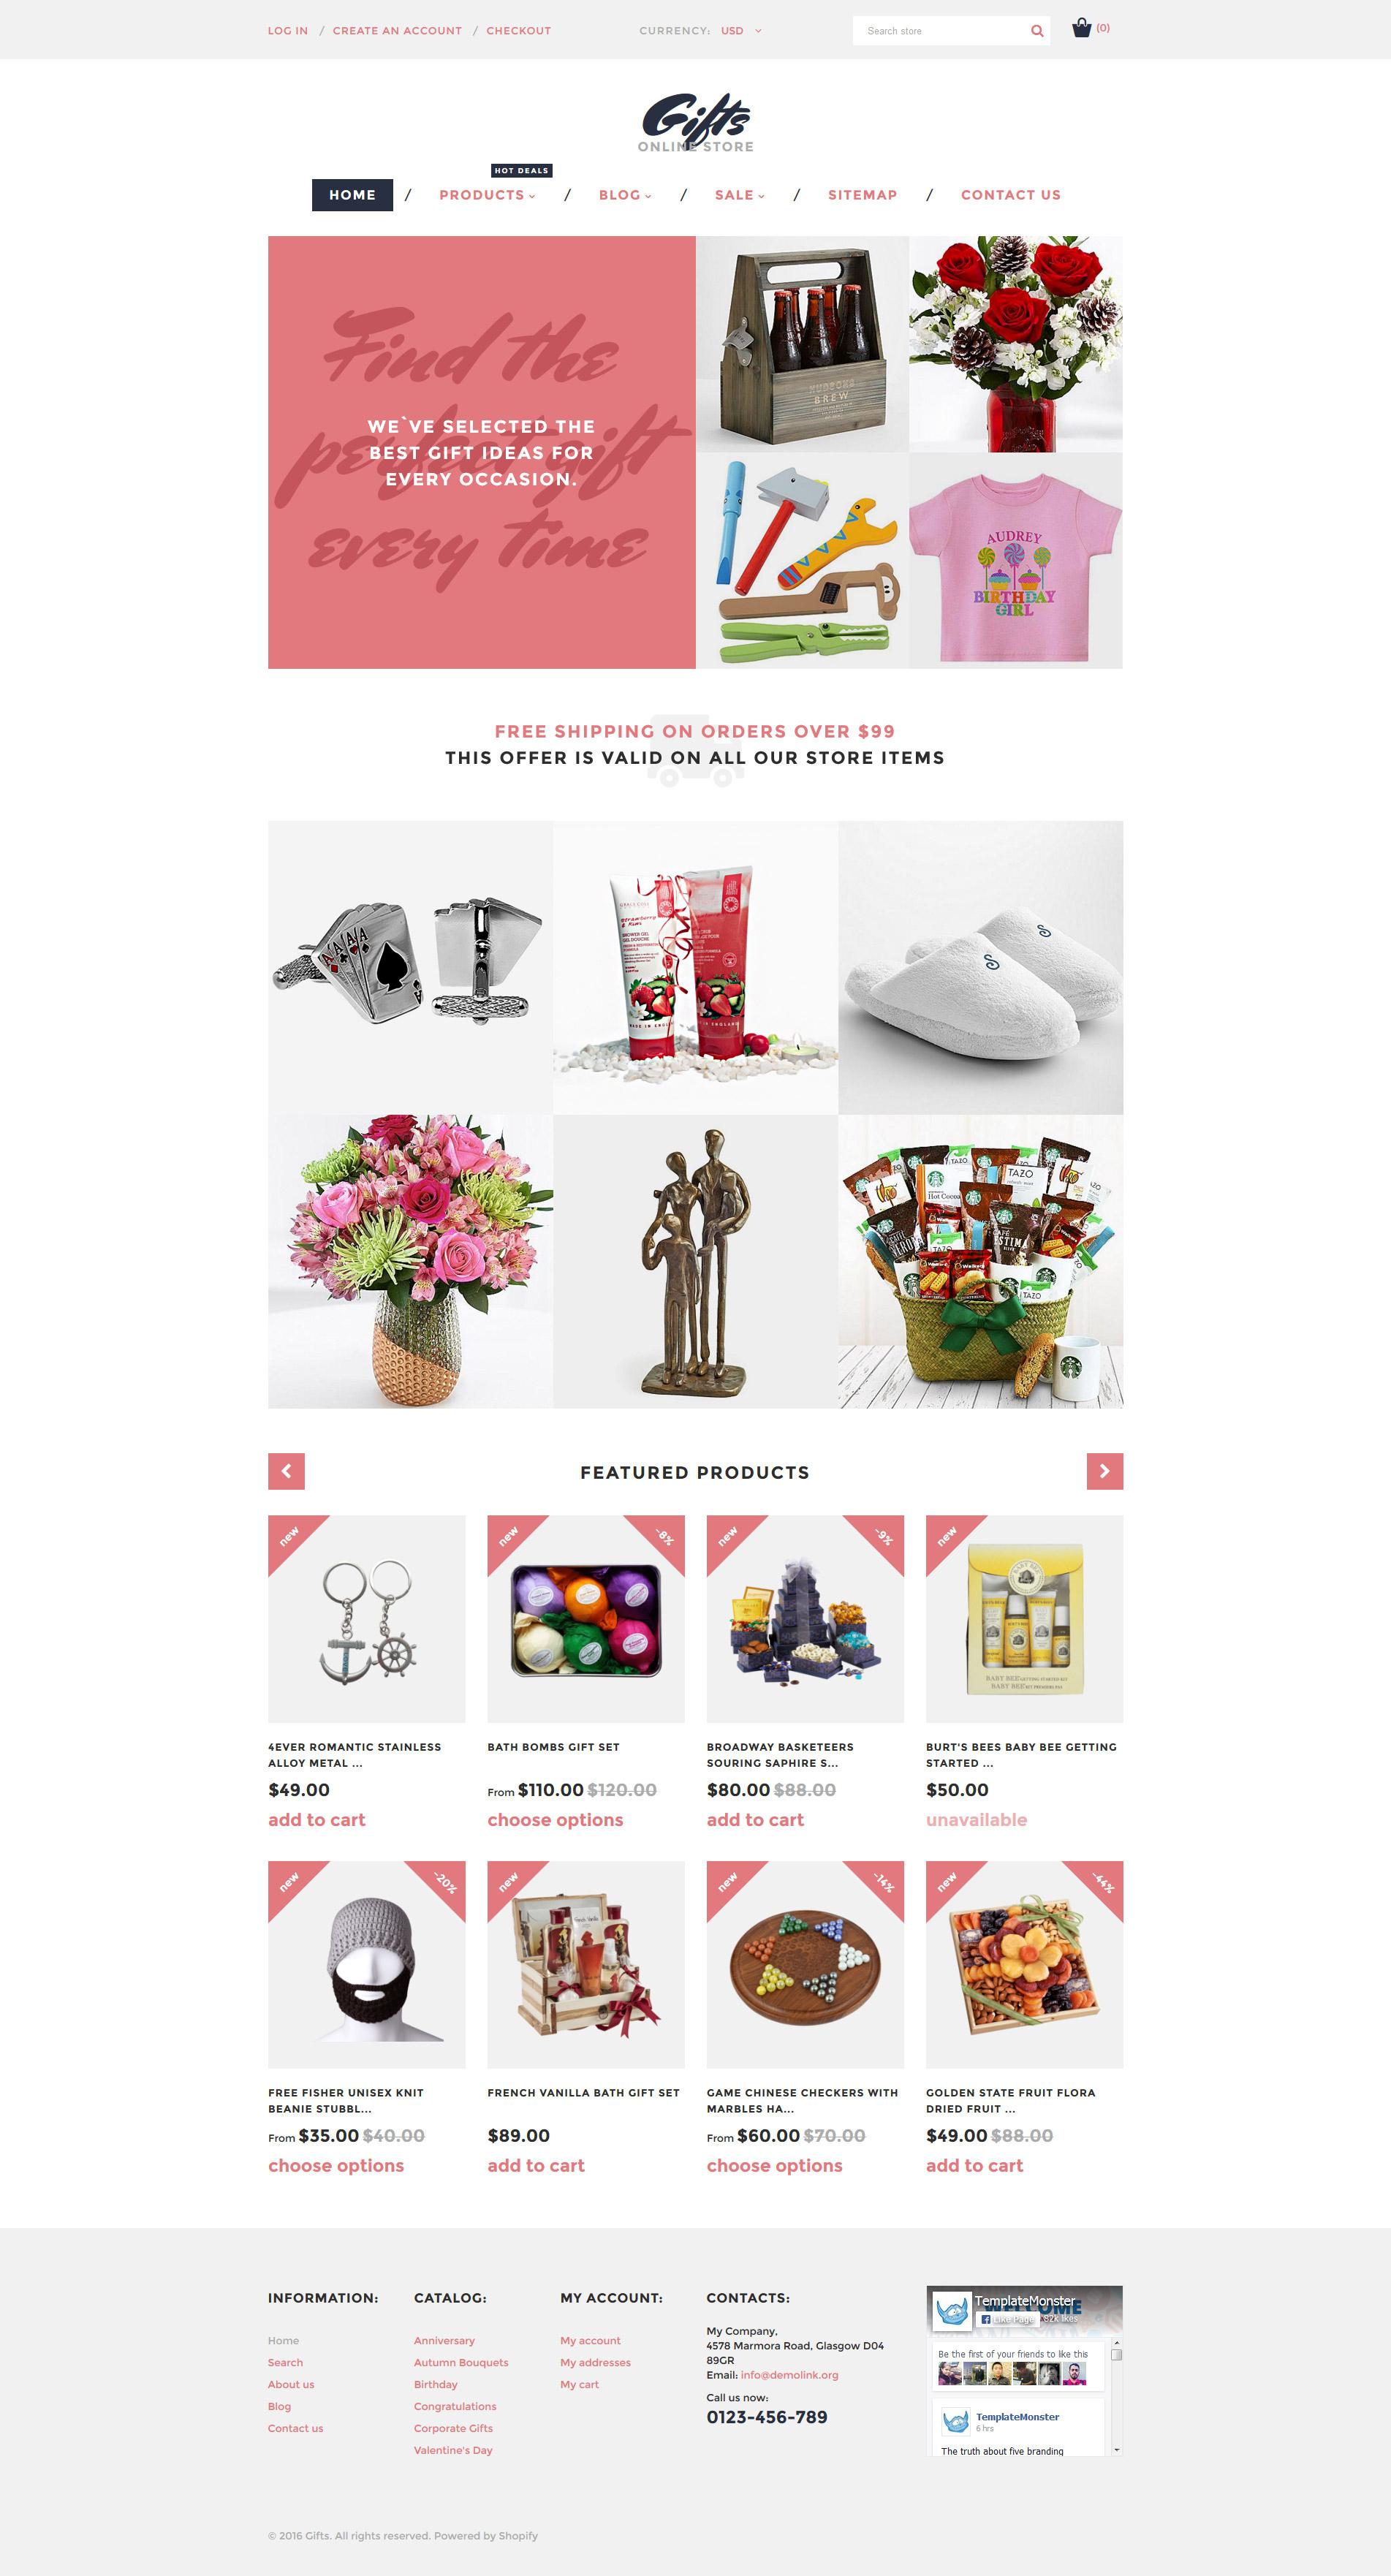 Responsywny szablon Shopify Gifts Online Store #58278 - zrzut ekranu